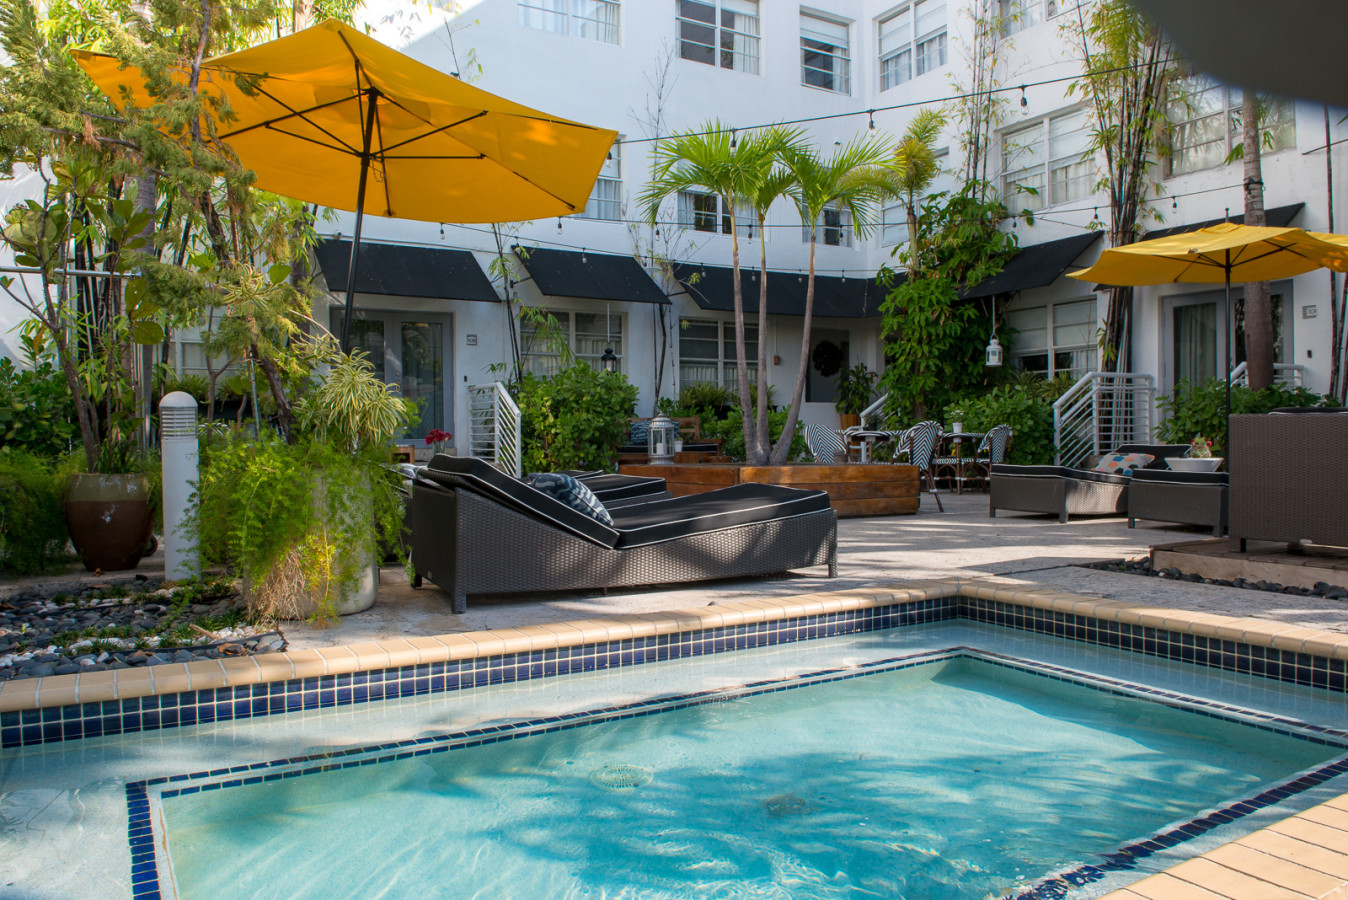 Splash Pool at the Metropol South Beach